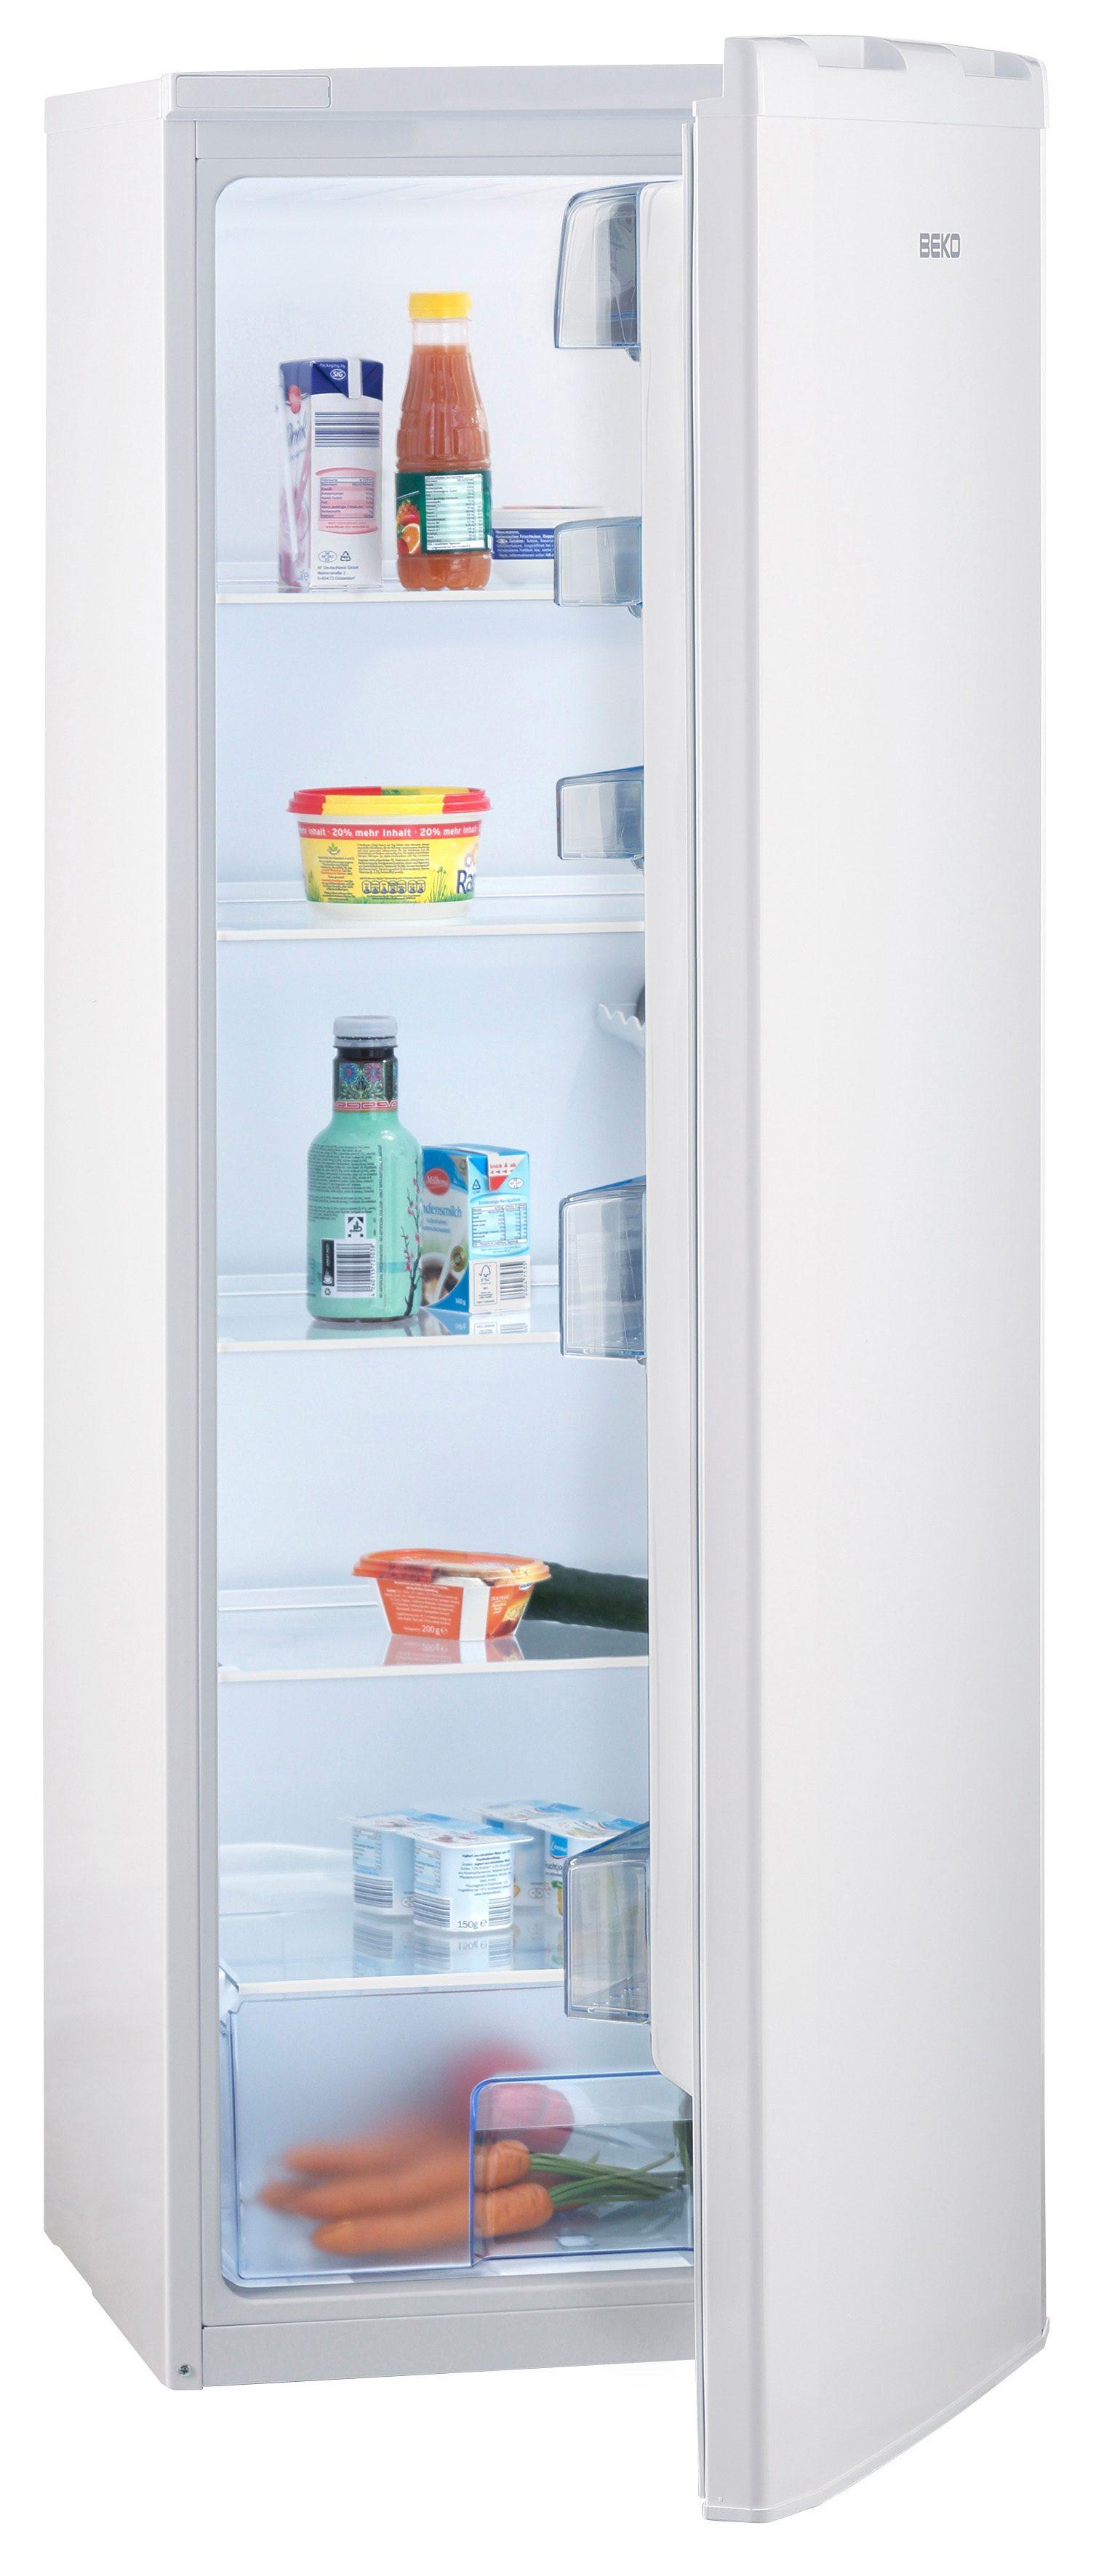 Beko Kühlschrank SSE 26026, A+, 145,6 cm hoch